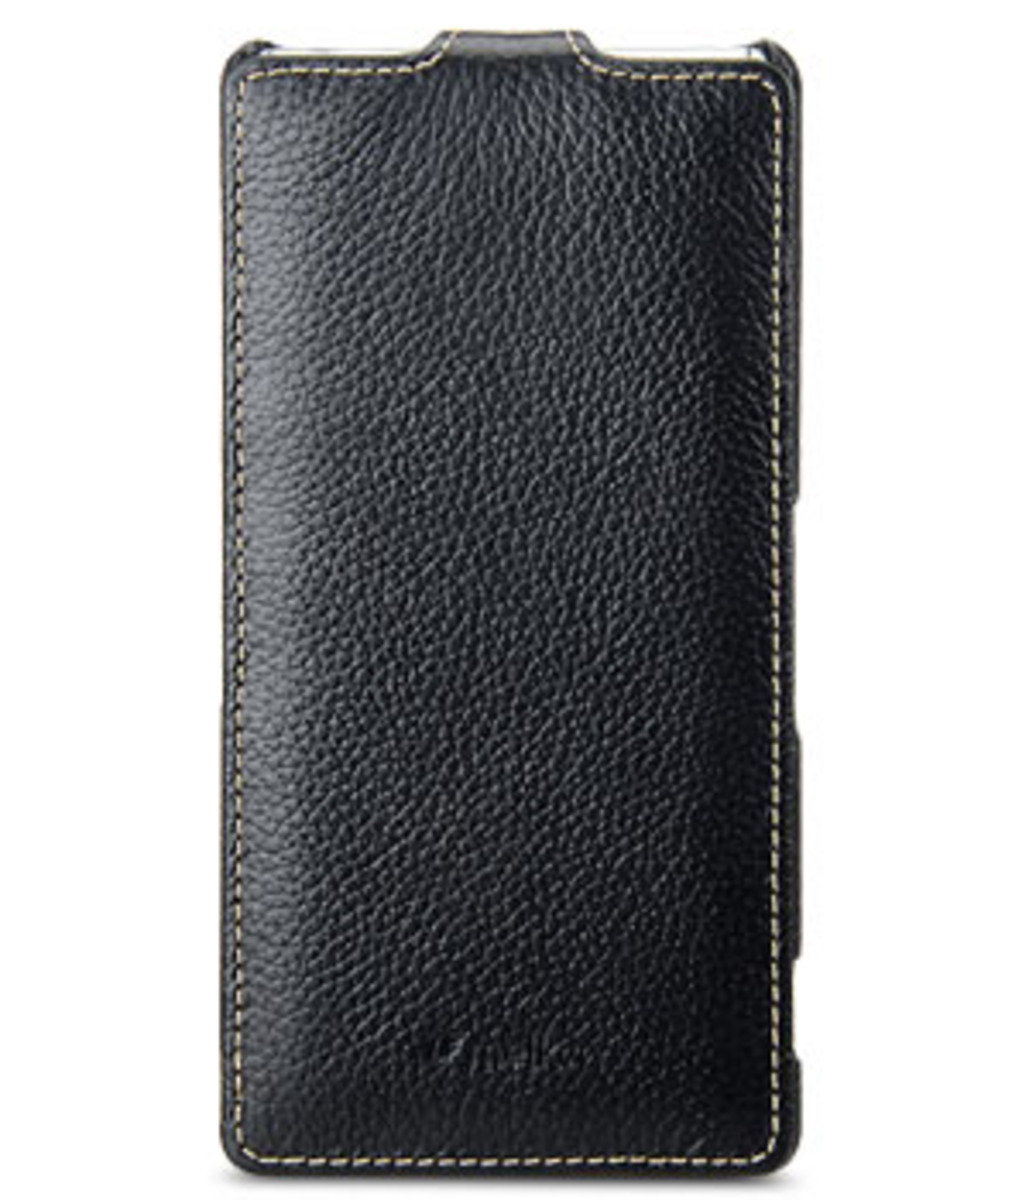 Sony Xperia Z3 D6653  Jacka Type 高級真皮革手機套 (黑色荔枝條紋)